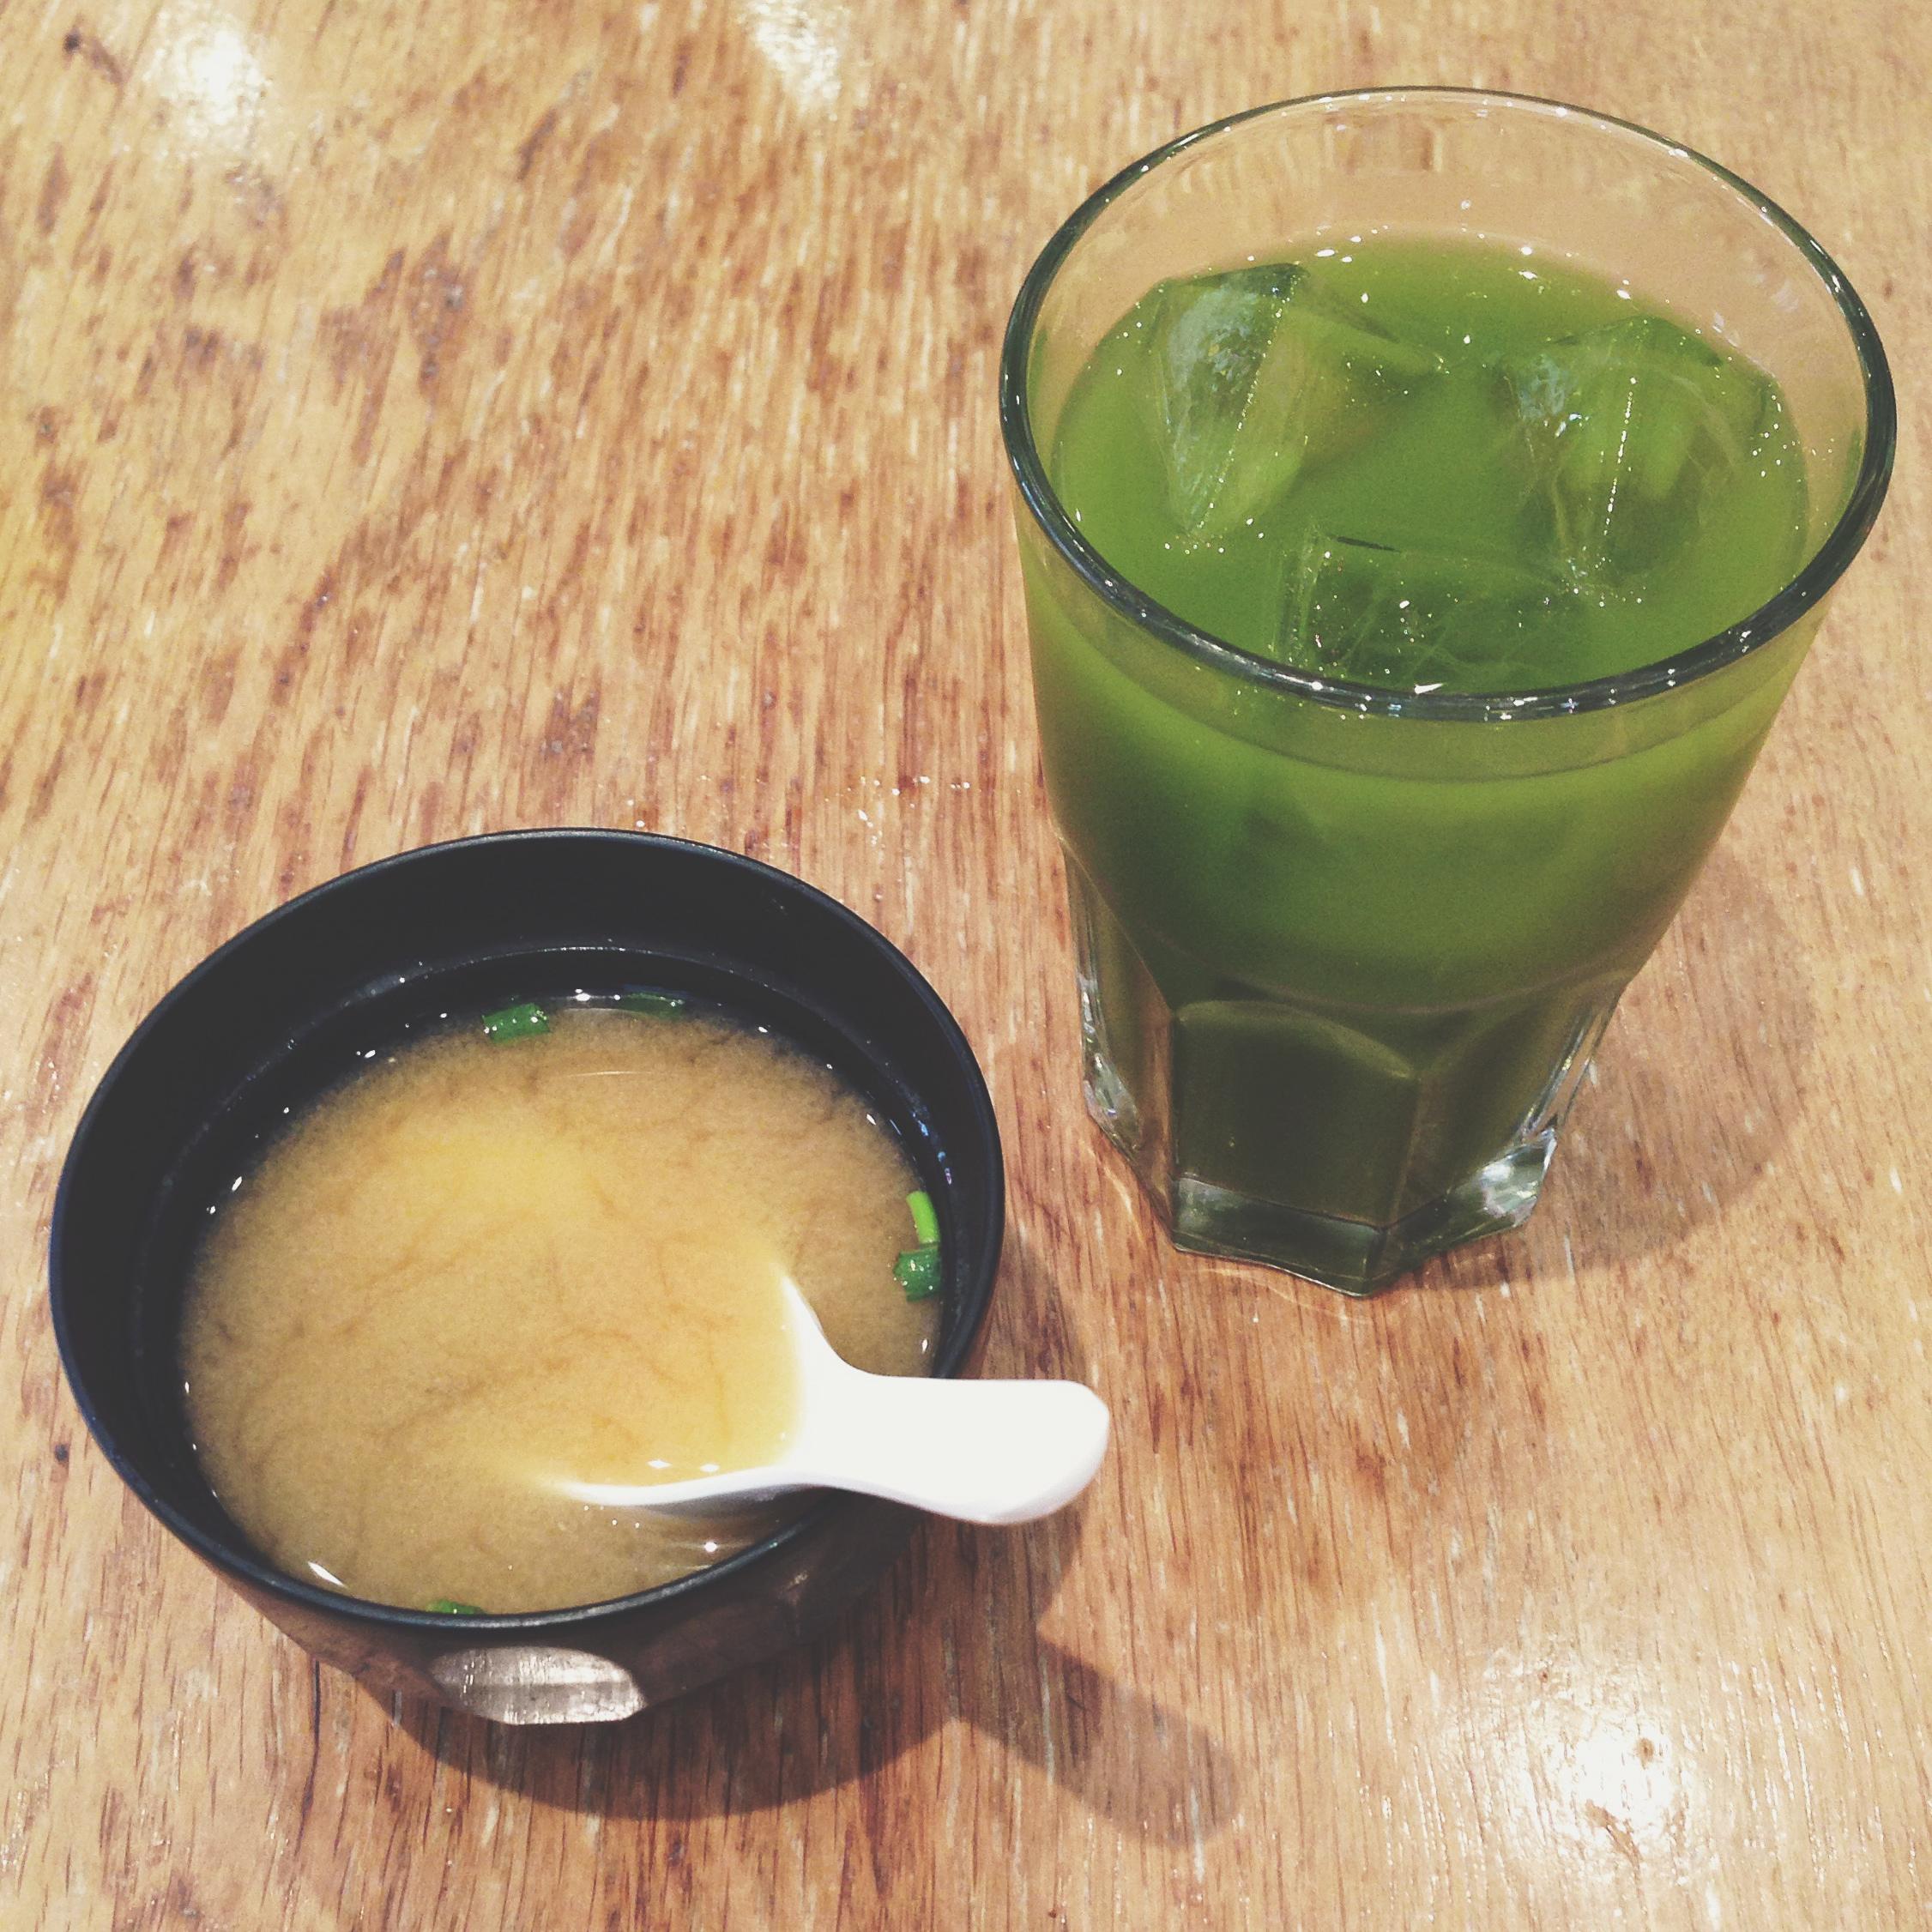 Eating at Kadoya (Japanese) restaurant